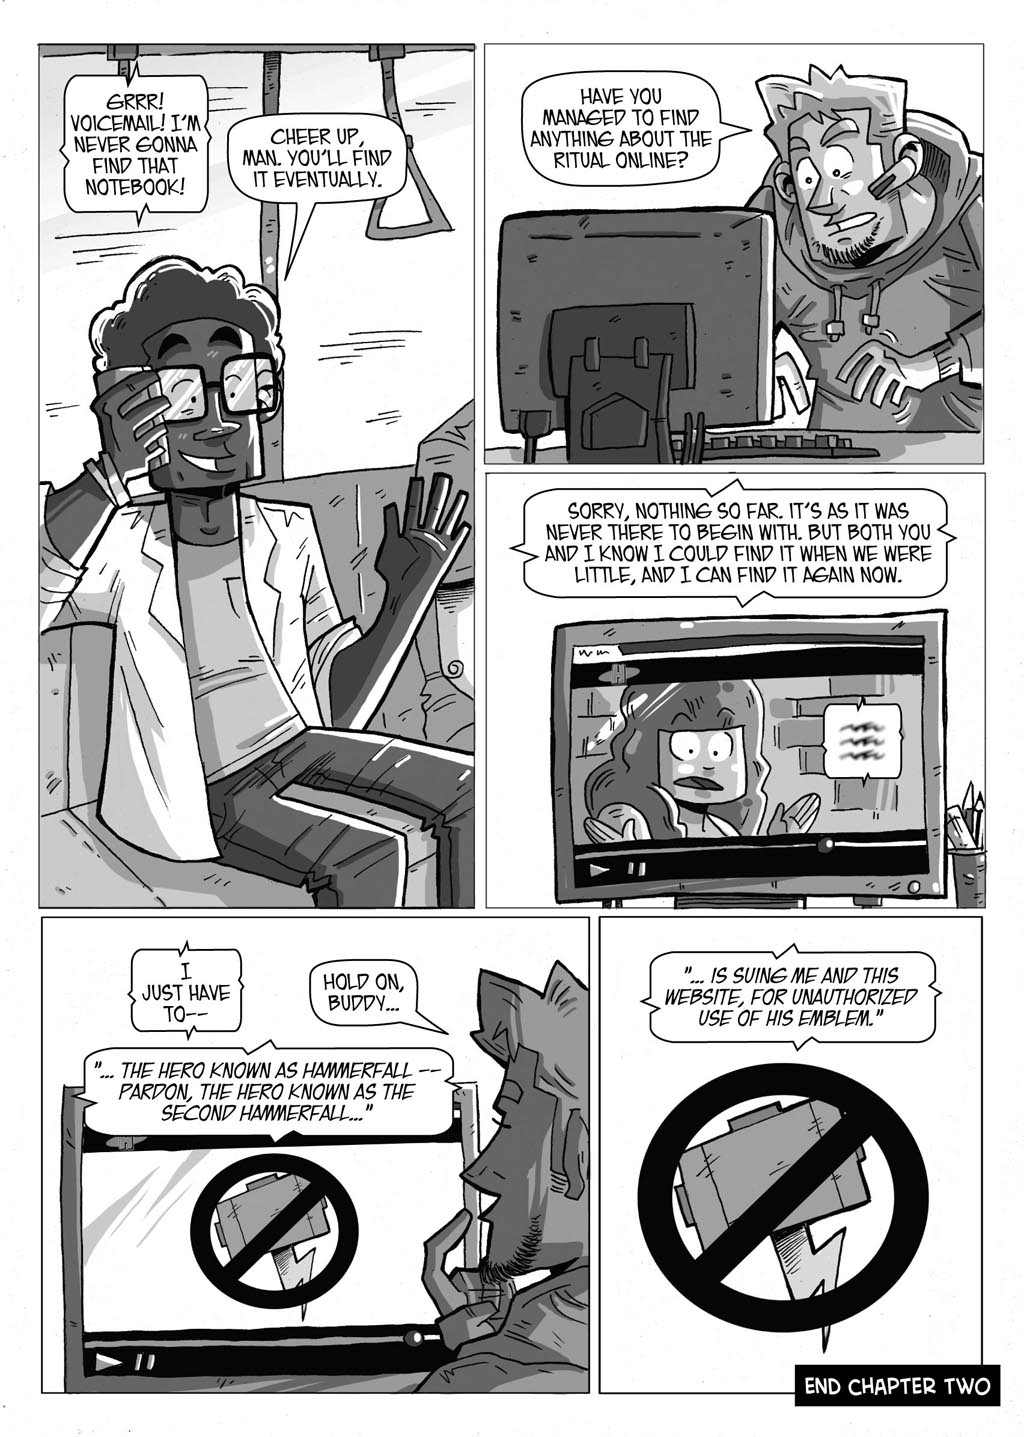 Portent - Page 14